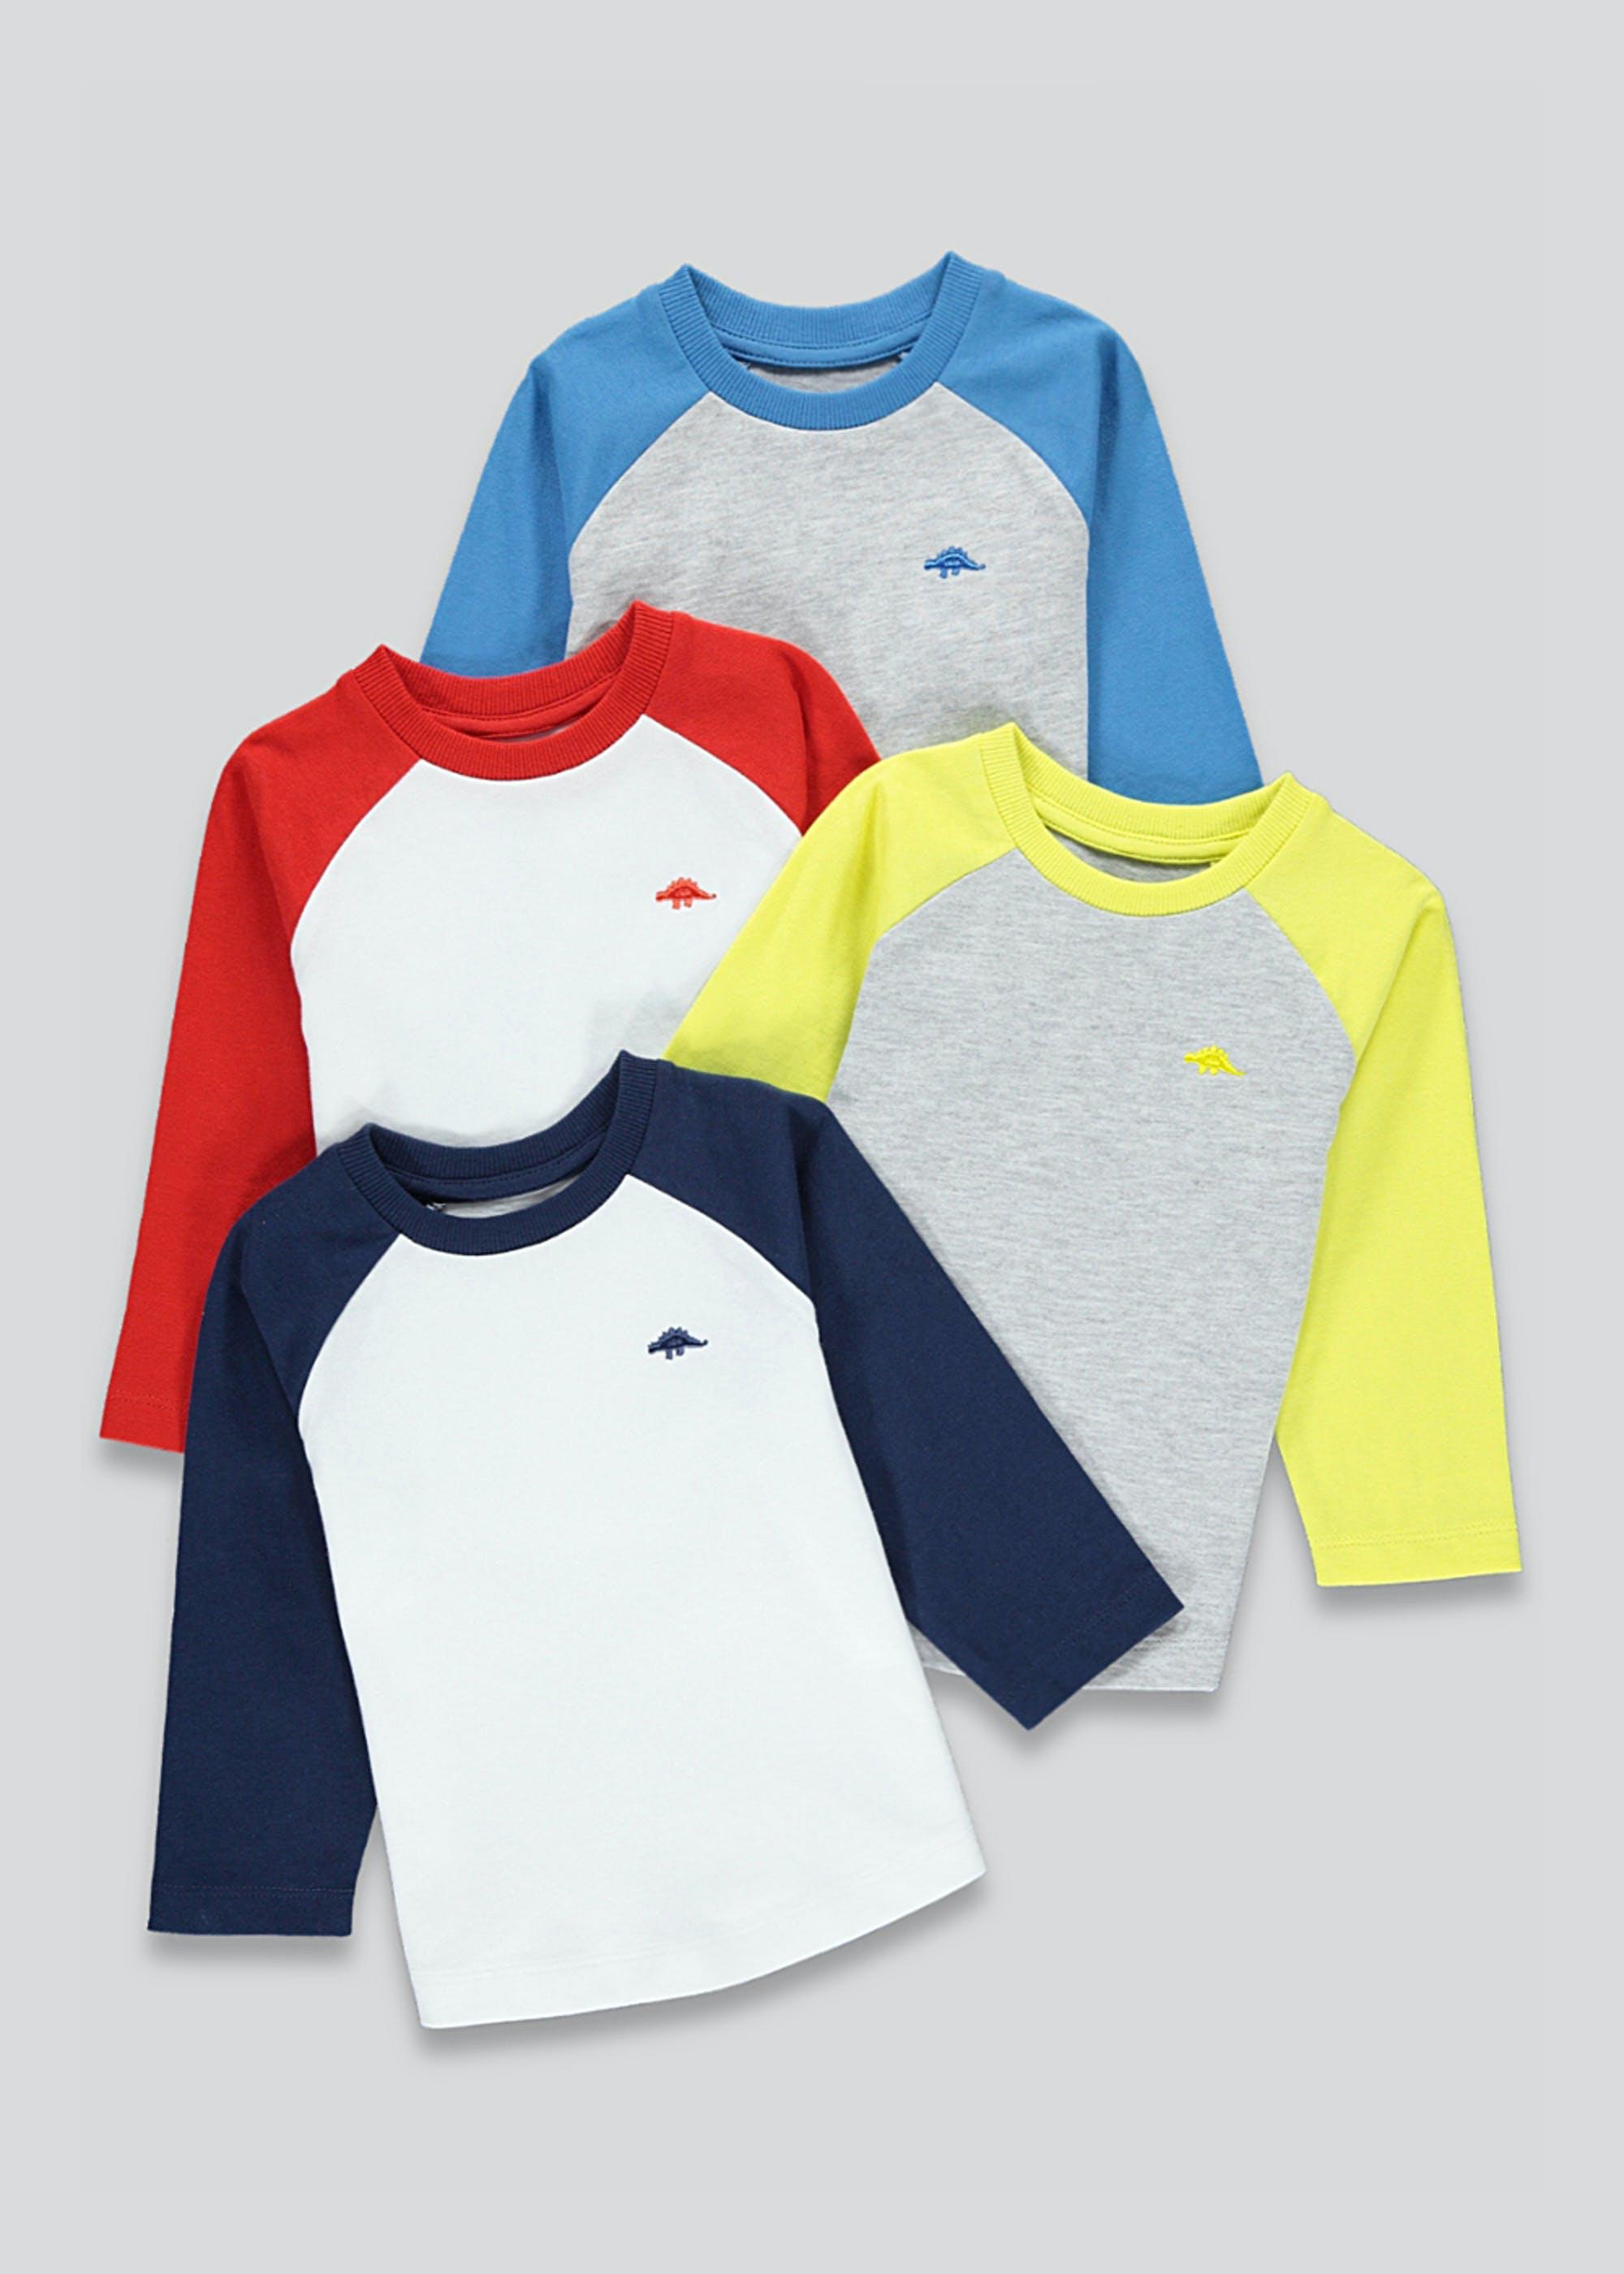 Toddler 4 Pack Long Sleeve Raglan T-Shirts Age 12-18 Months - £4.50 & Free Click & Collect @ Matalan